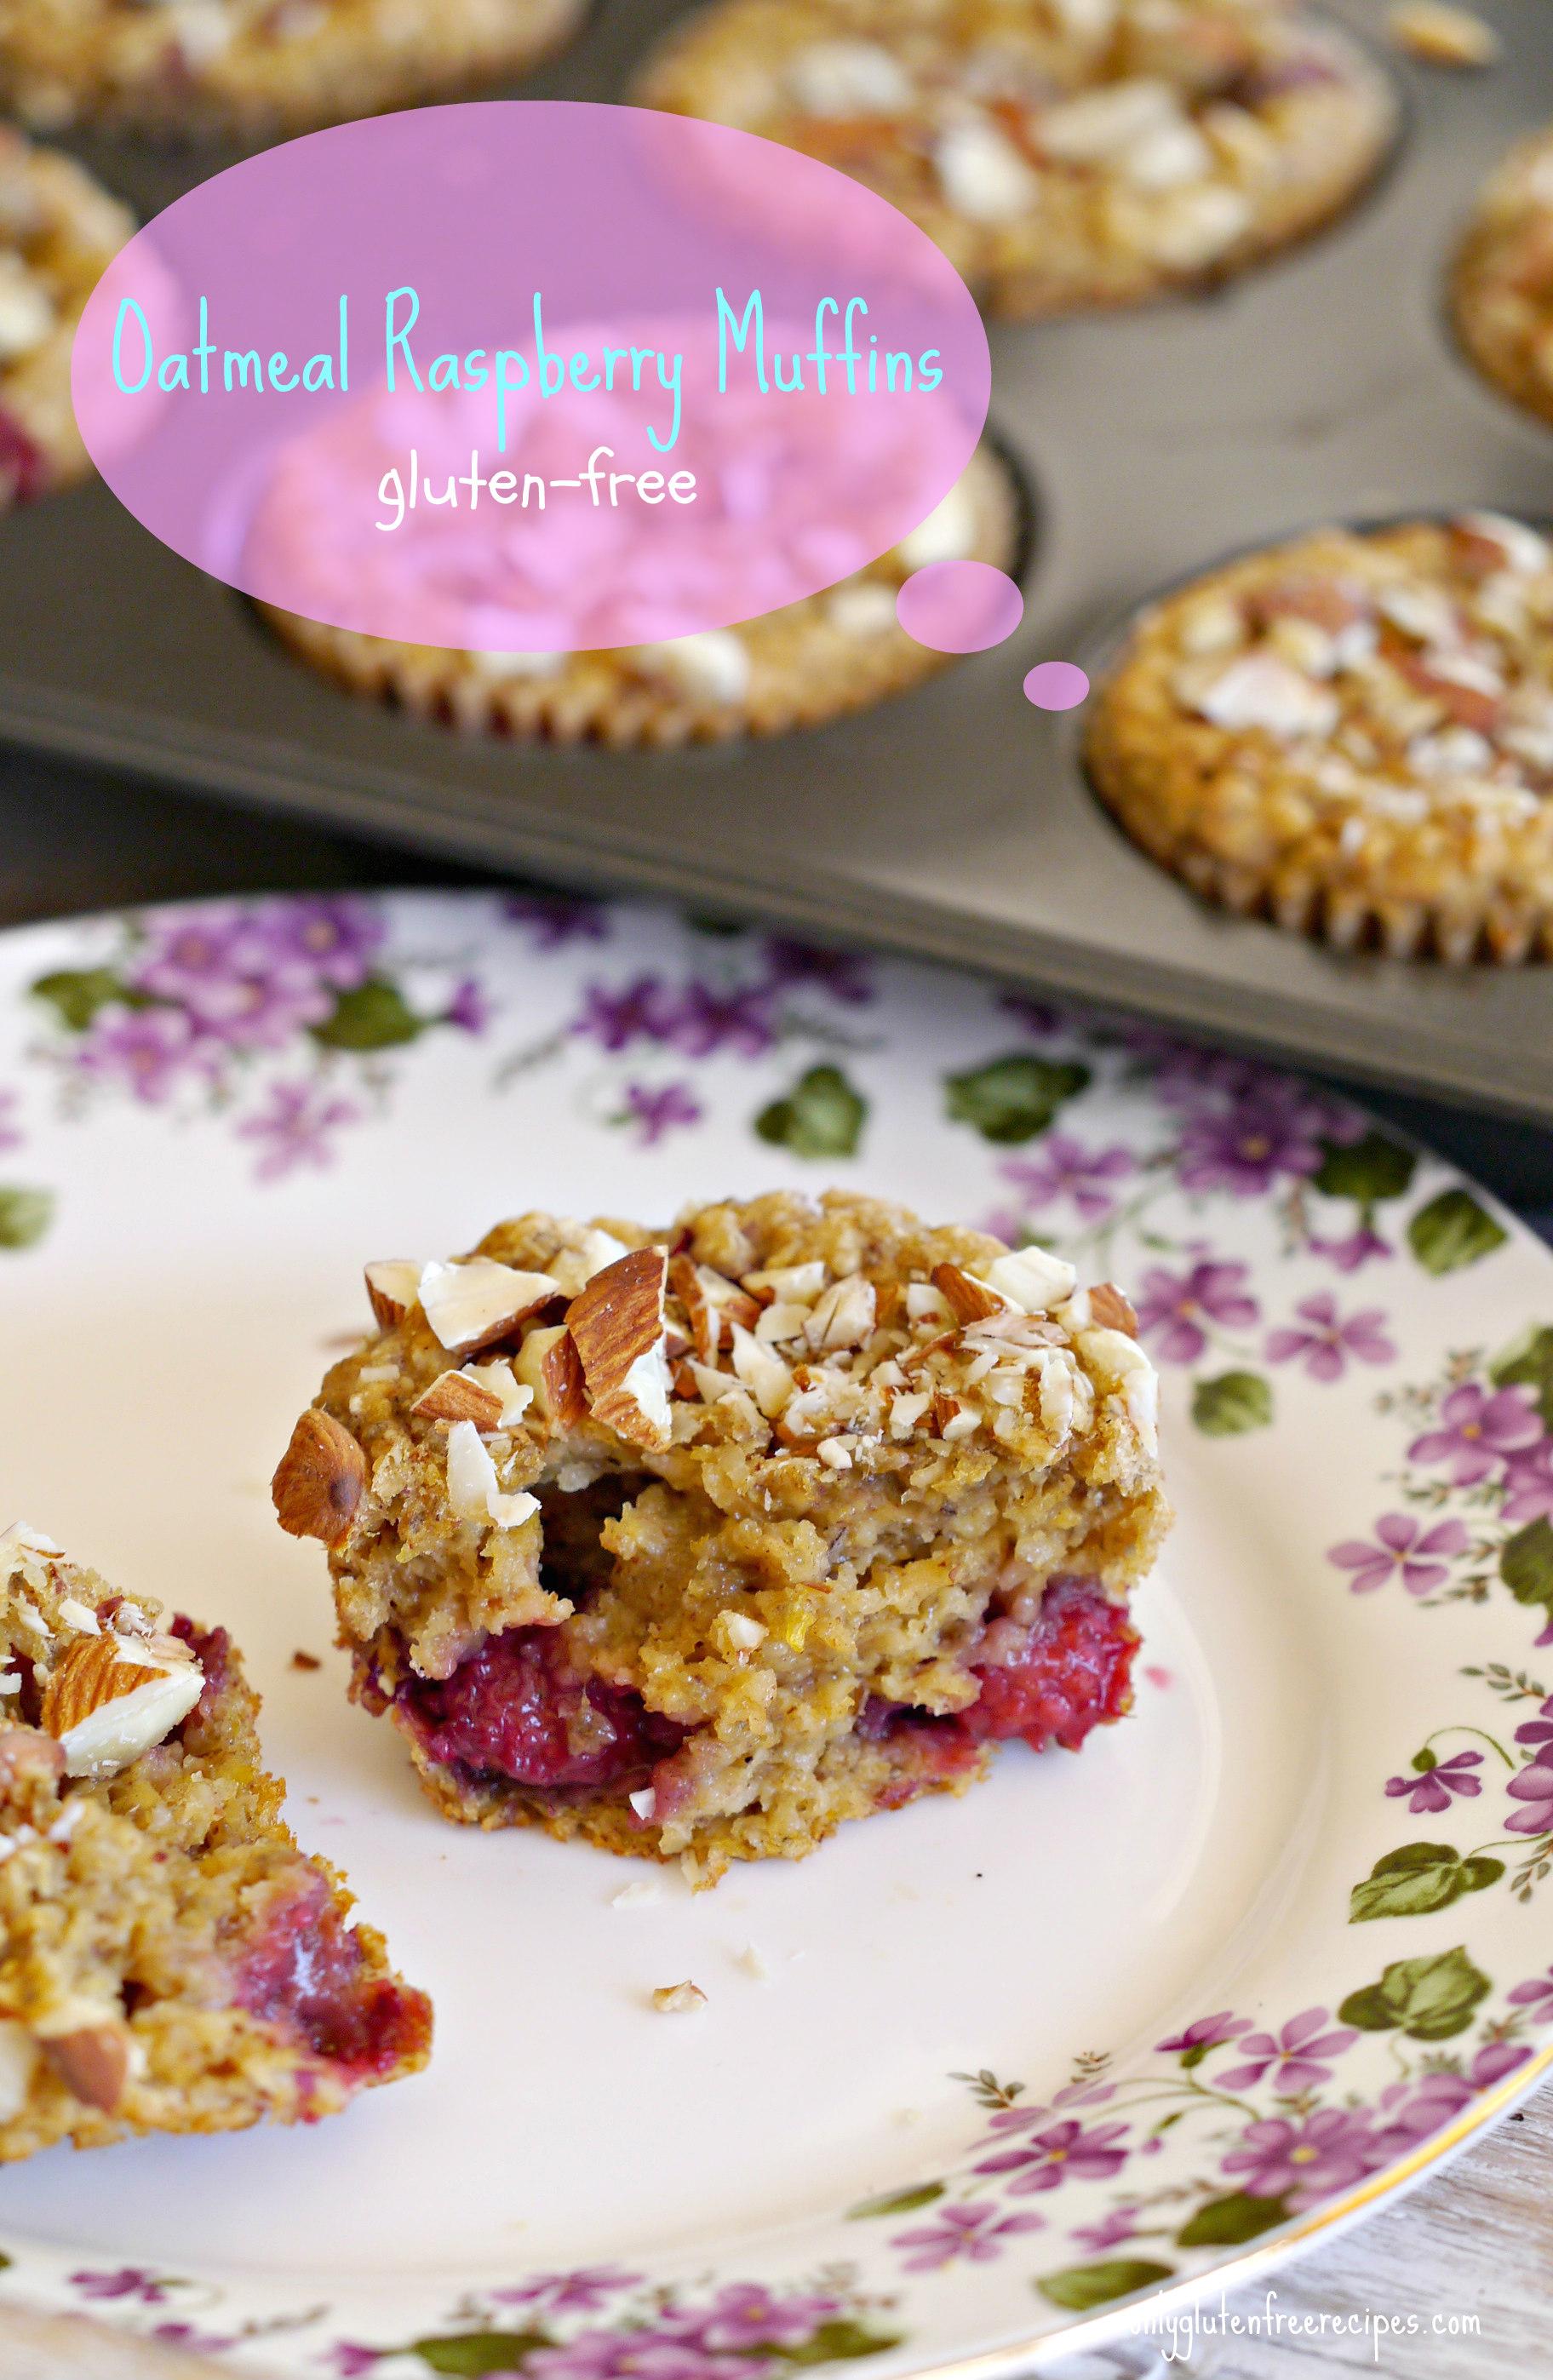 Gluten Free Oatmeal Raspberry Muffins